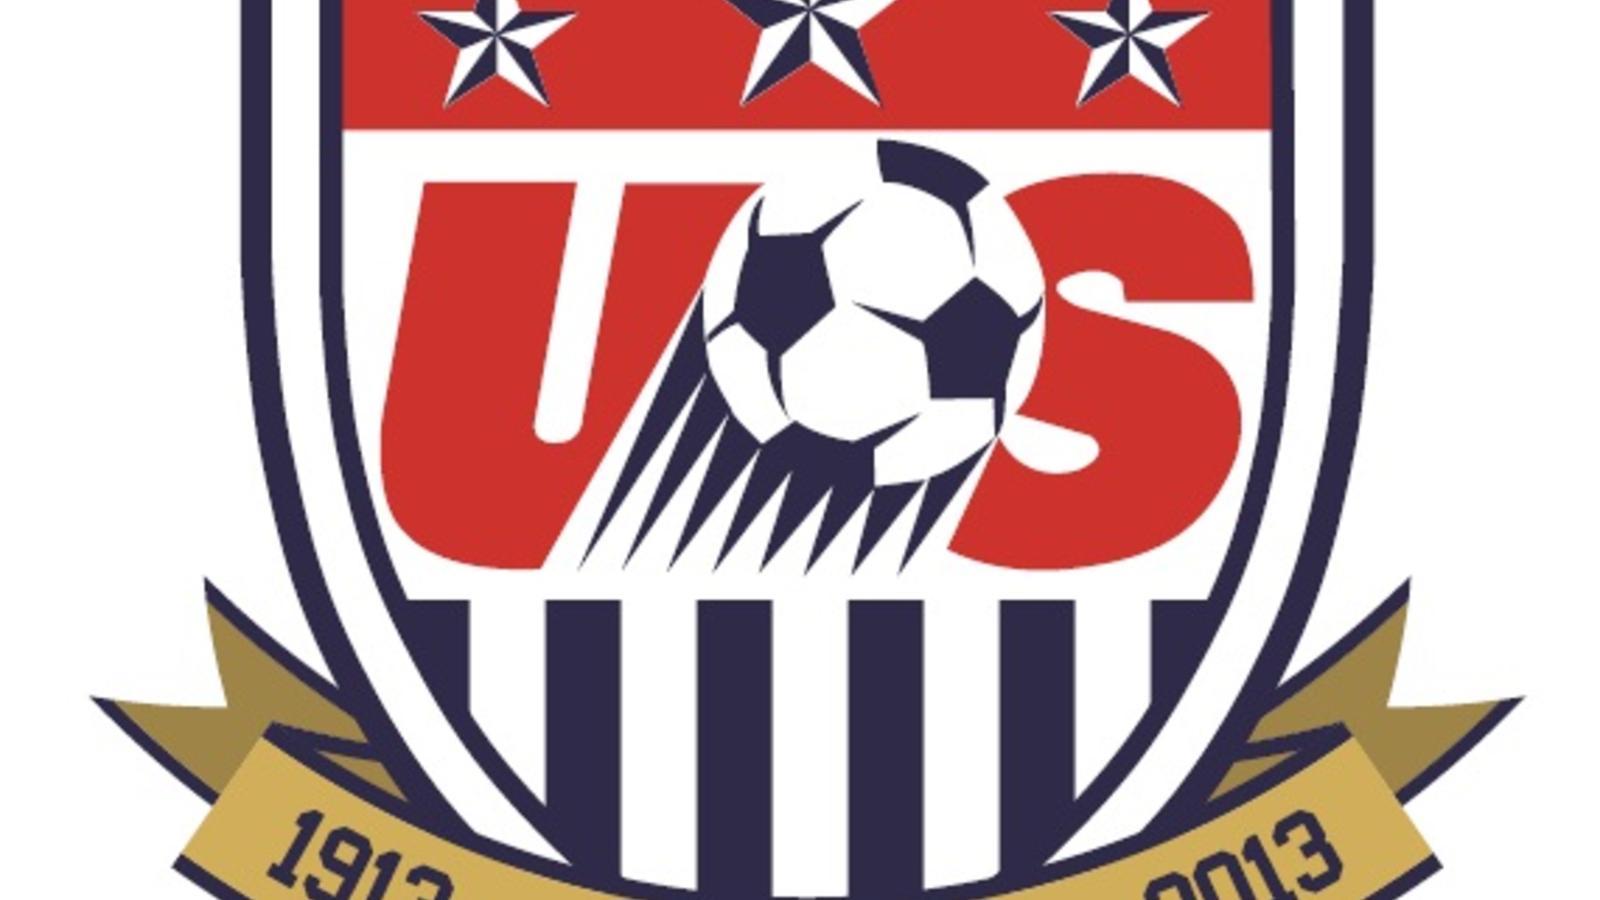 USsoccer_extension_logo